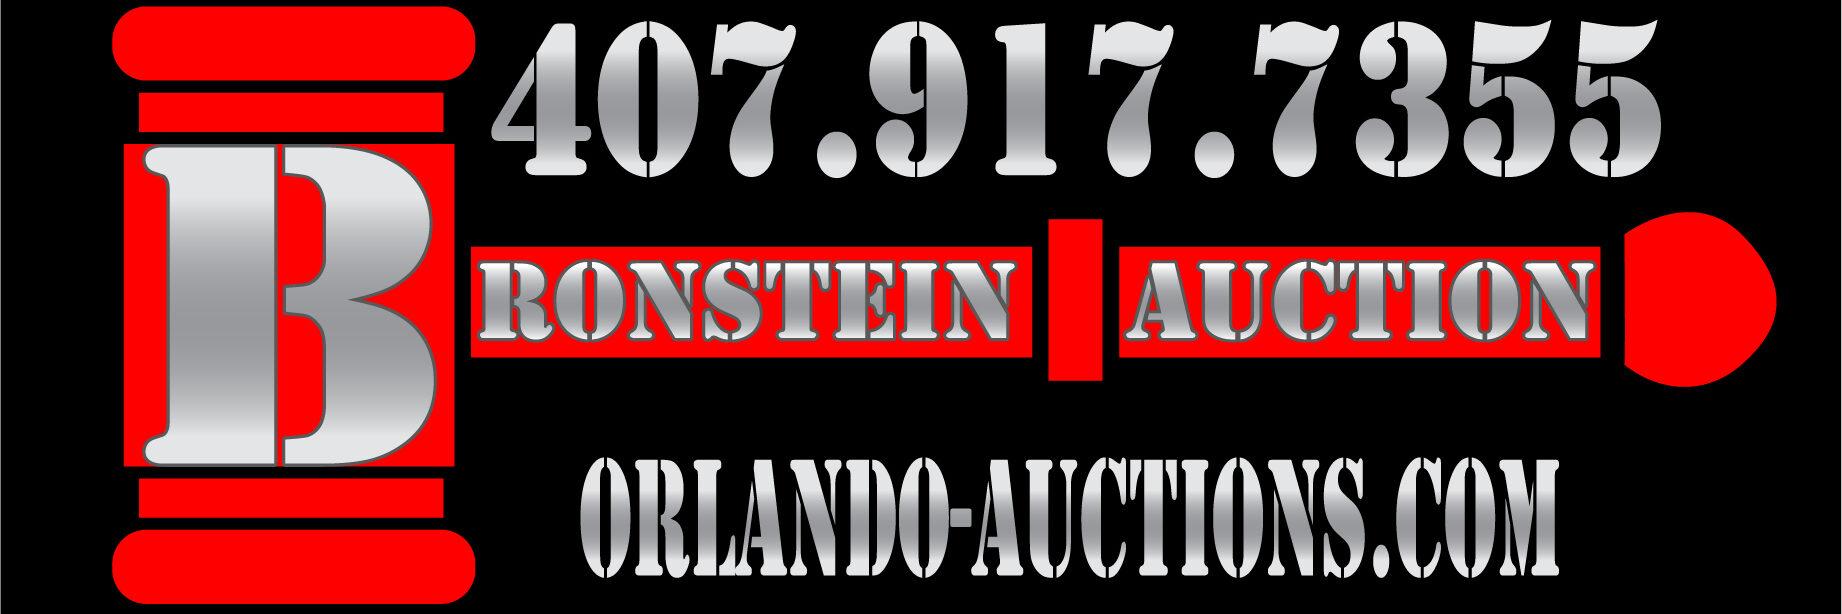 Bronstein Auction Co